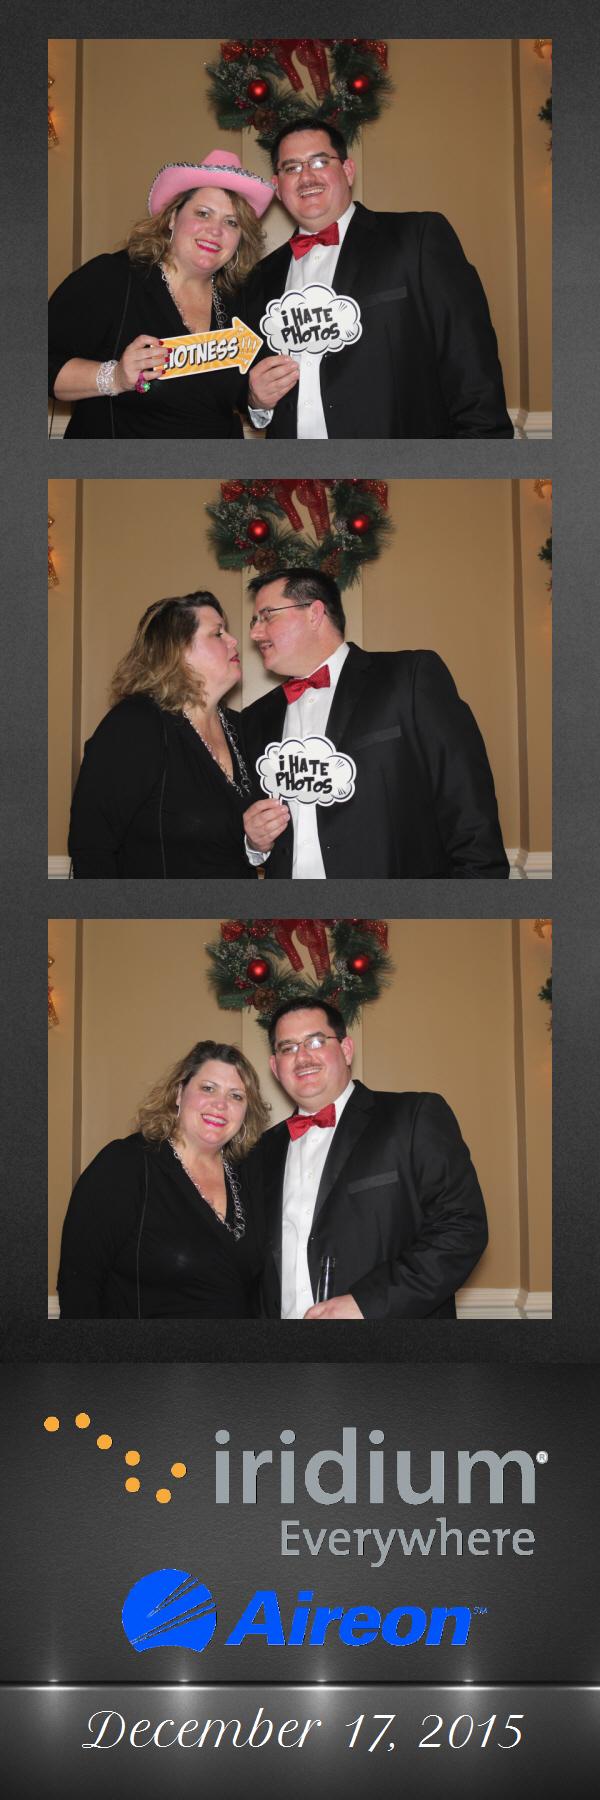 Guest House Events Photo Booth Iridium (21).jpg